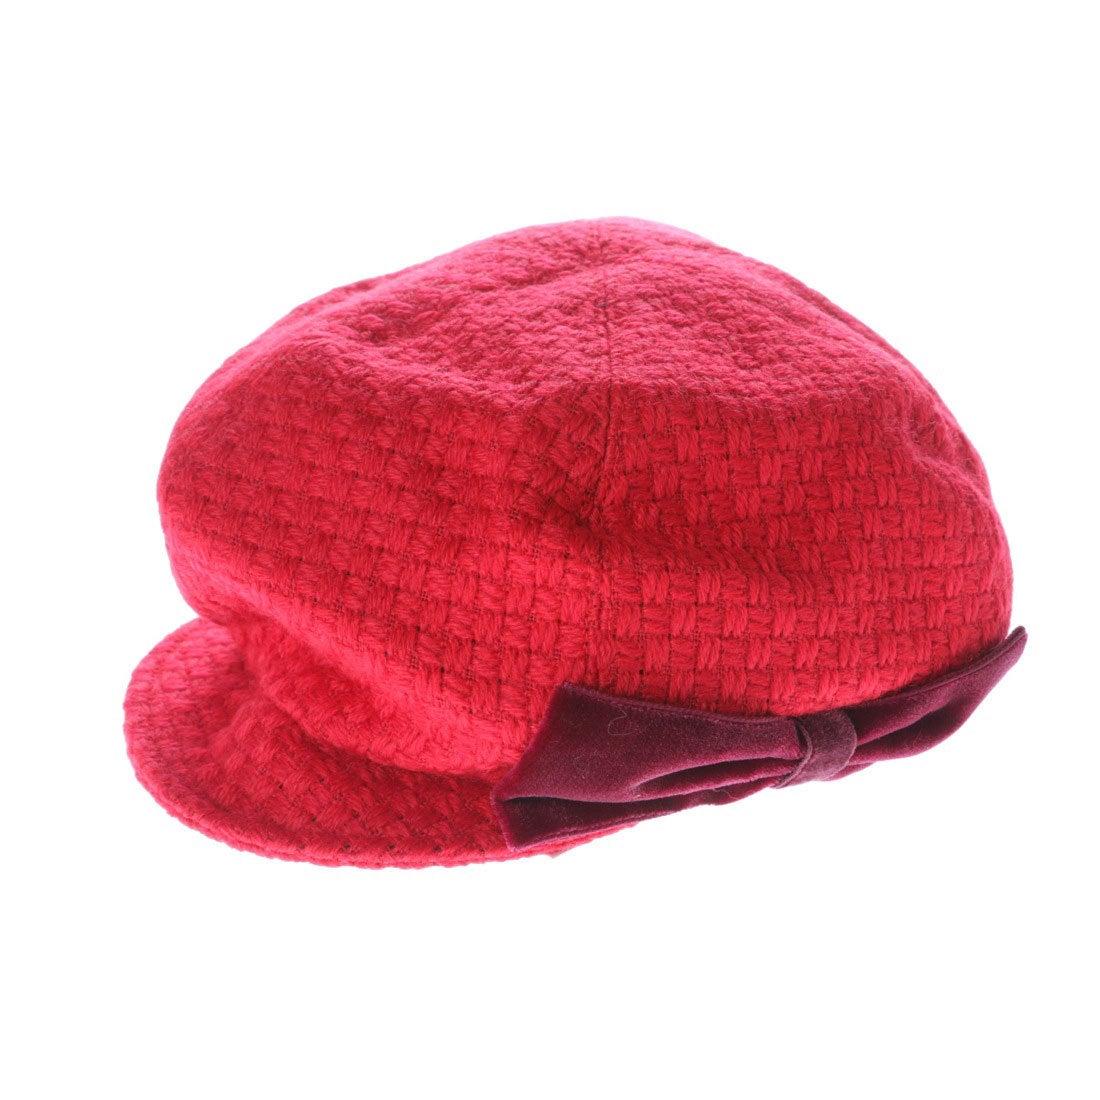 【SALE 80%OFF】セレク コレクション CELEC COLLECTION りぼんキャスケット帽子 (レッド)